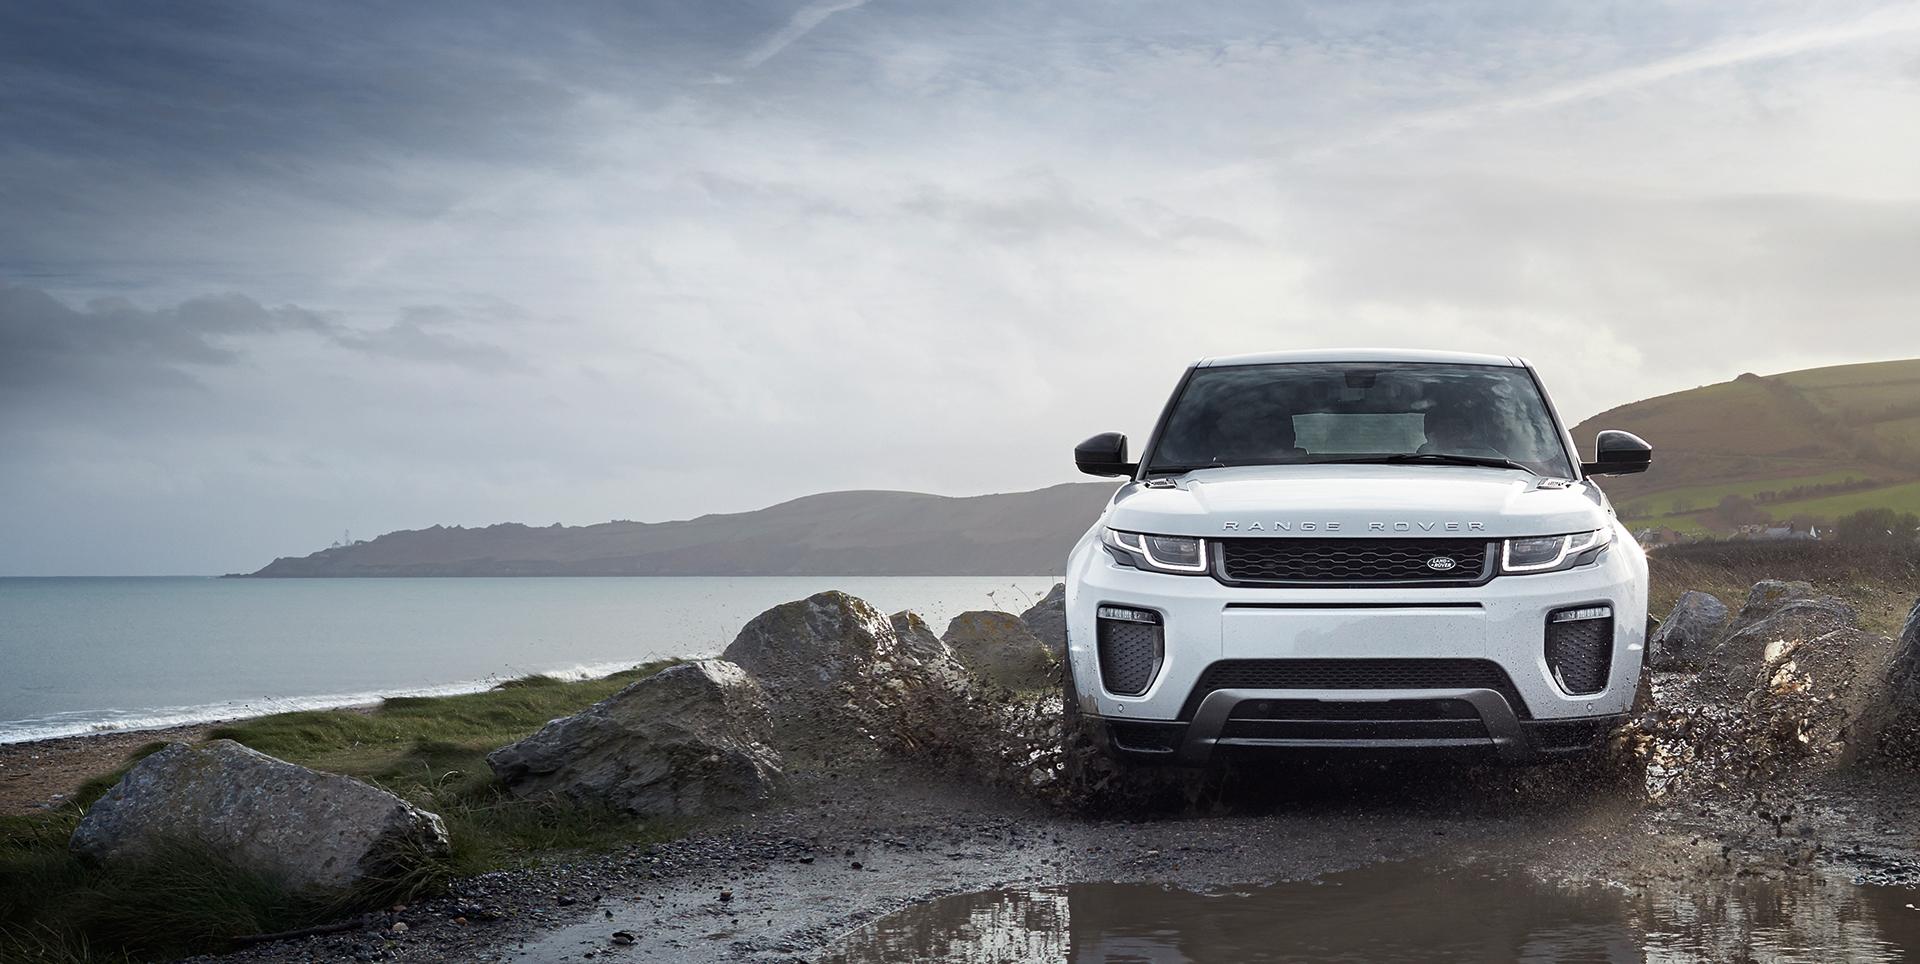 Land Rover Range Rover Evoque - 2016 - avant / front